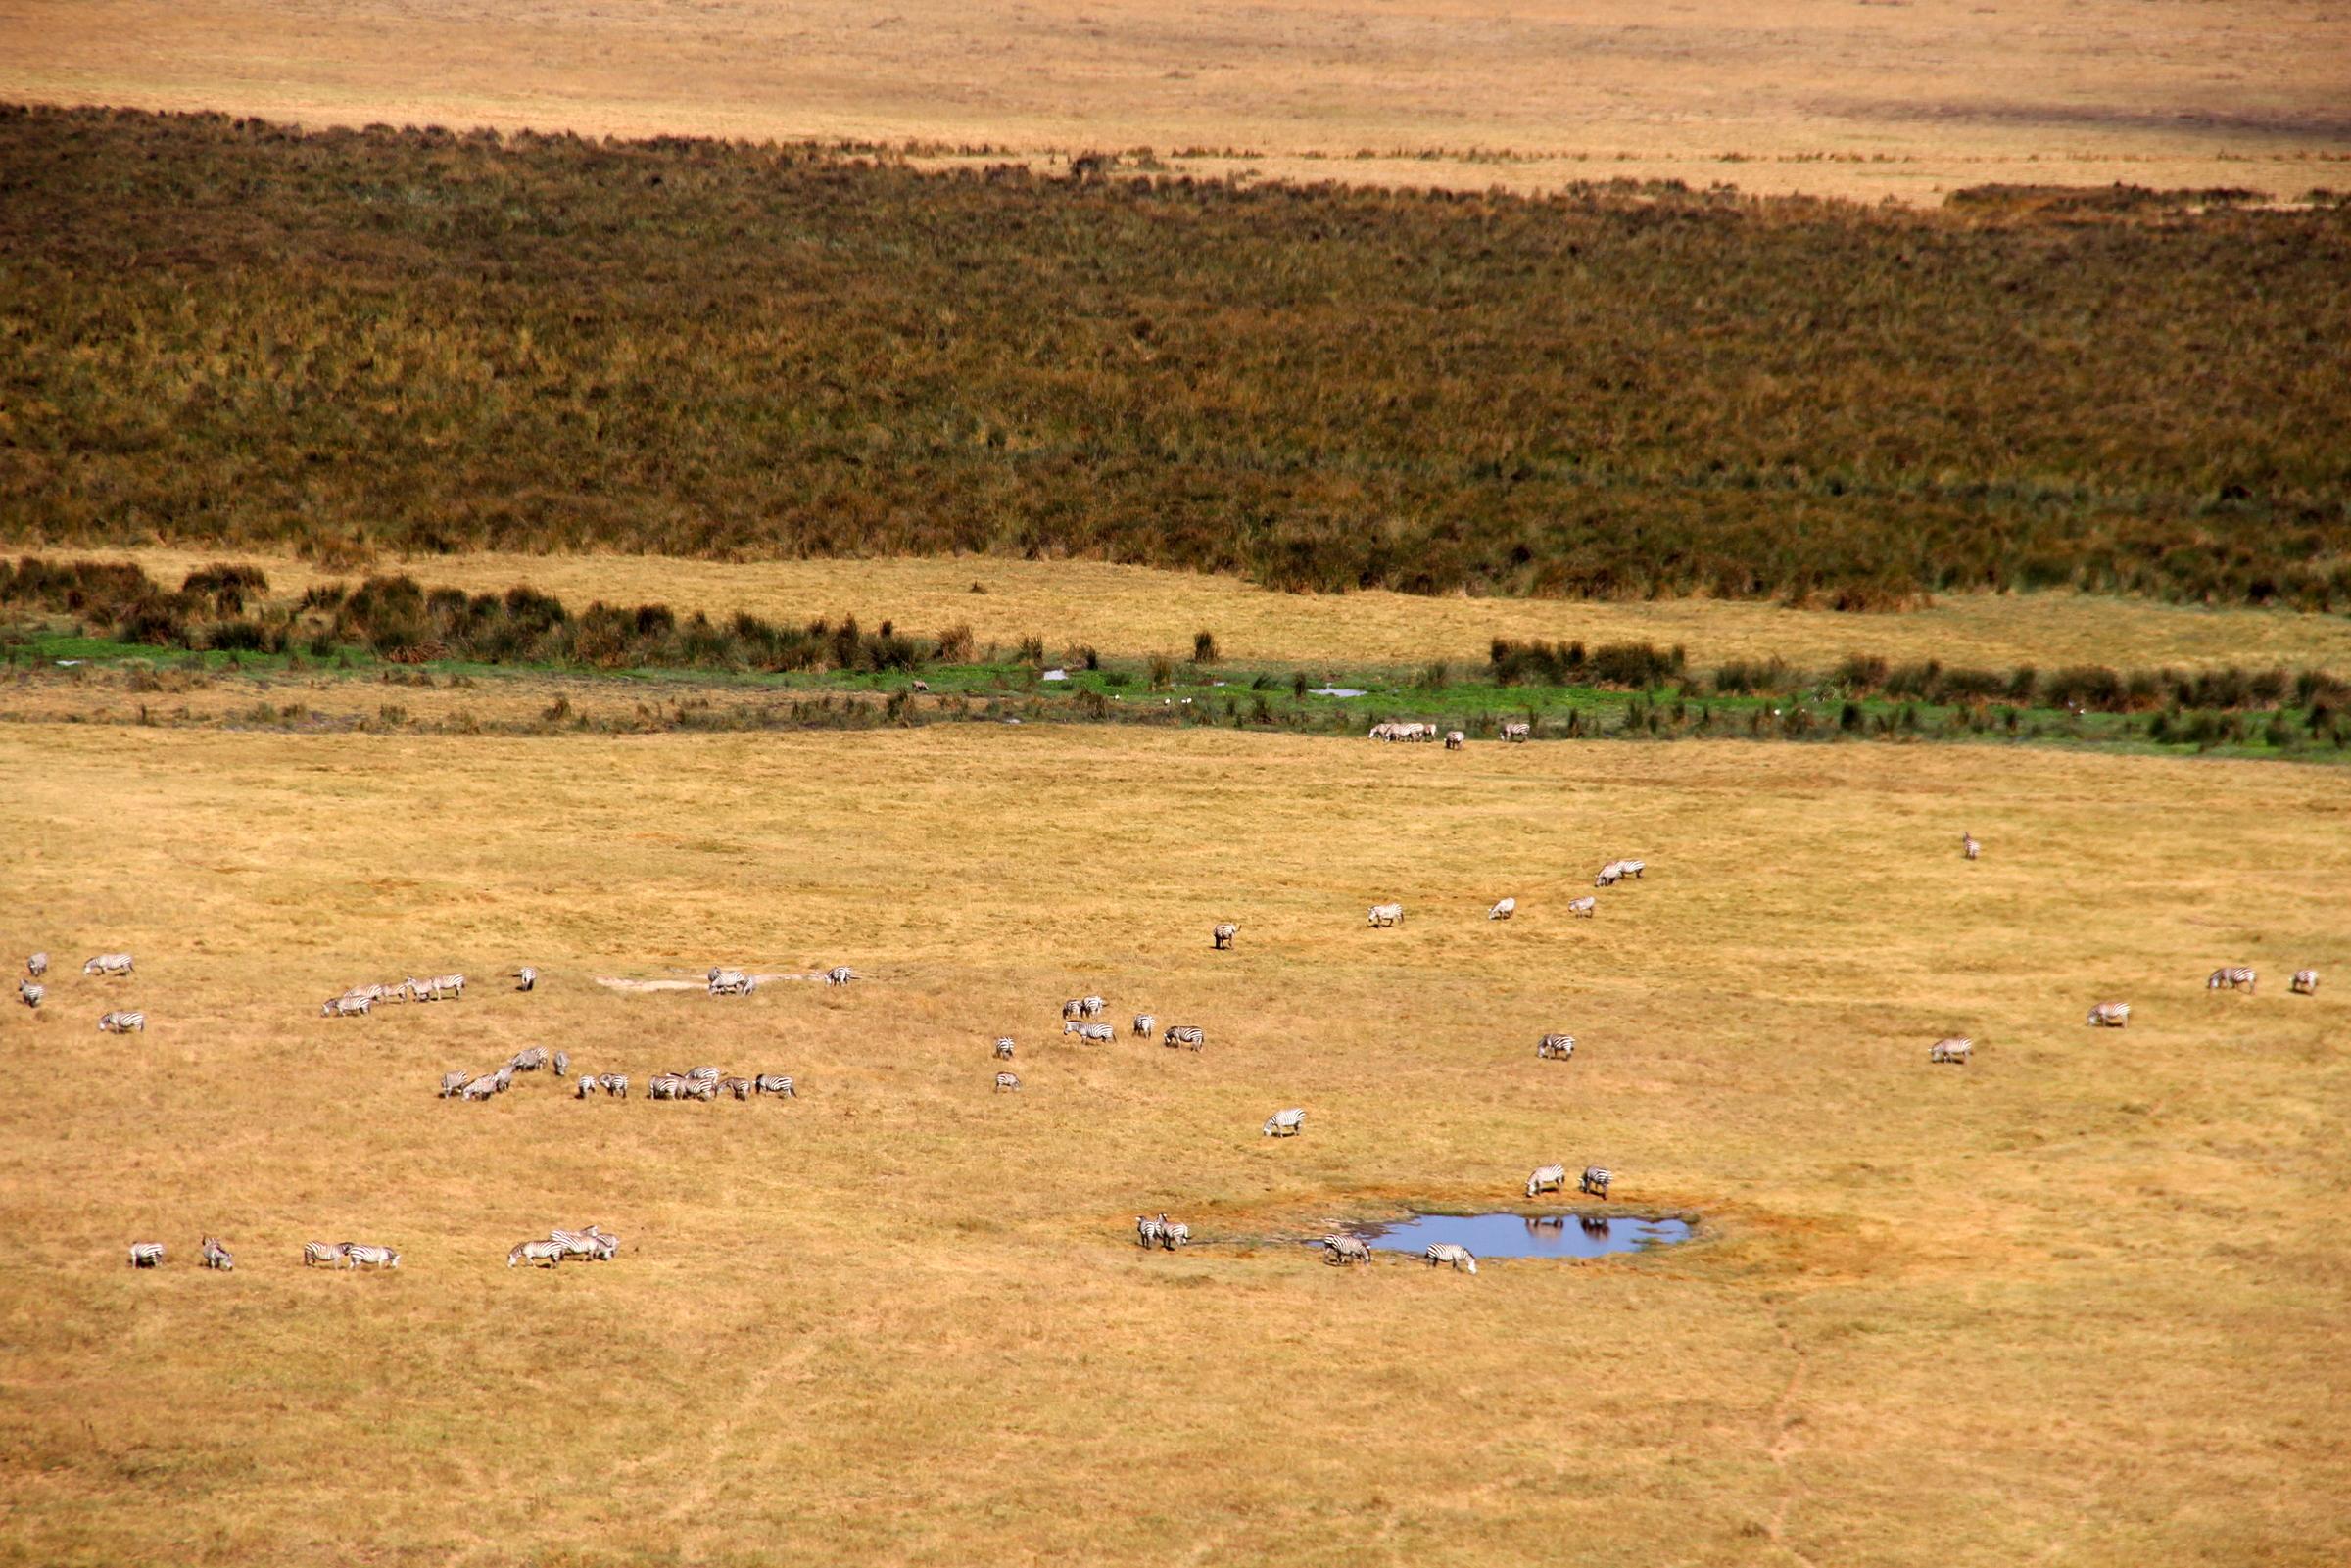 A Garden of Eden called Ngorongoro – Bona Travels